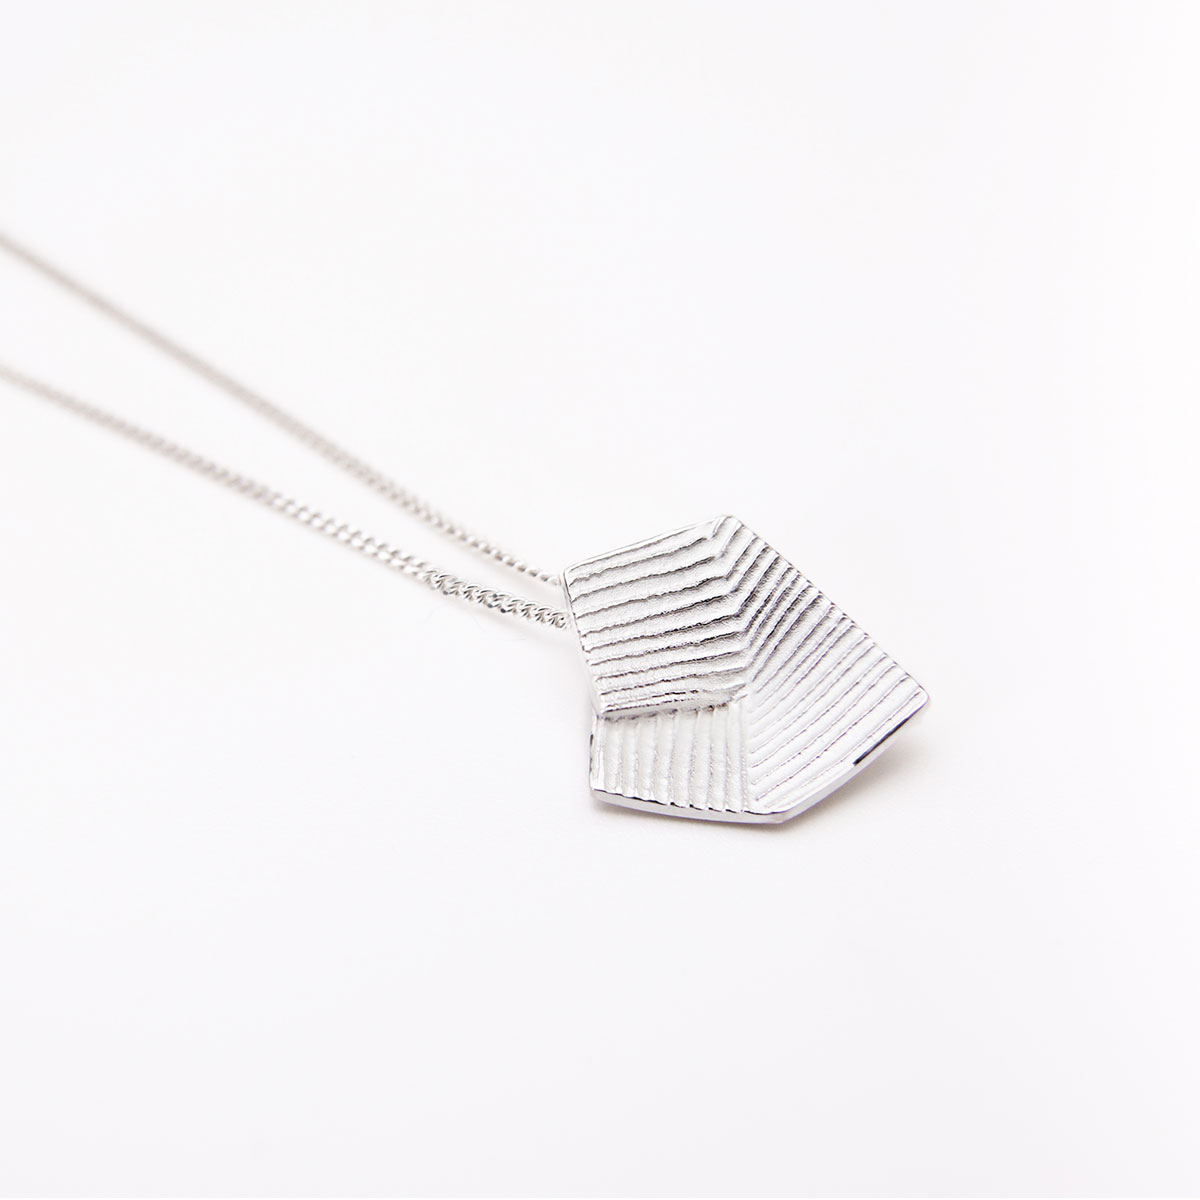 'Lines in Motion' Silver Pendant, Medium